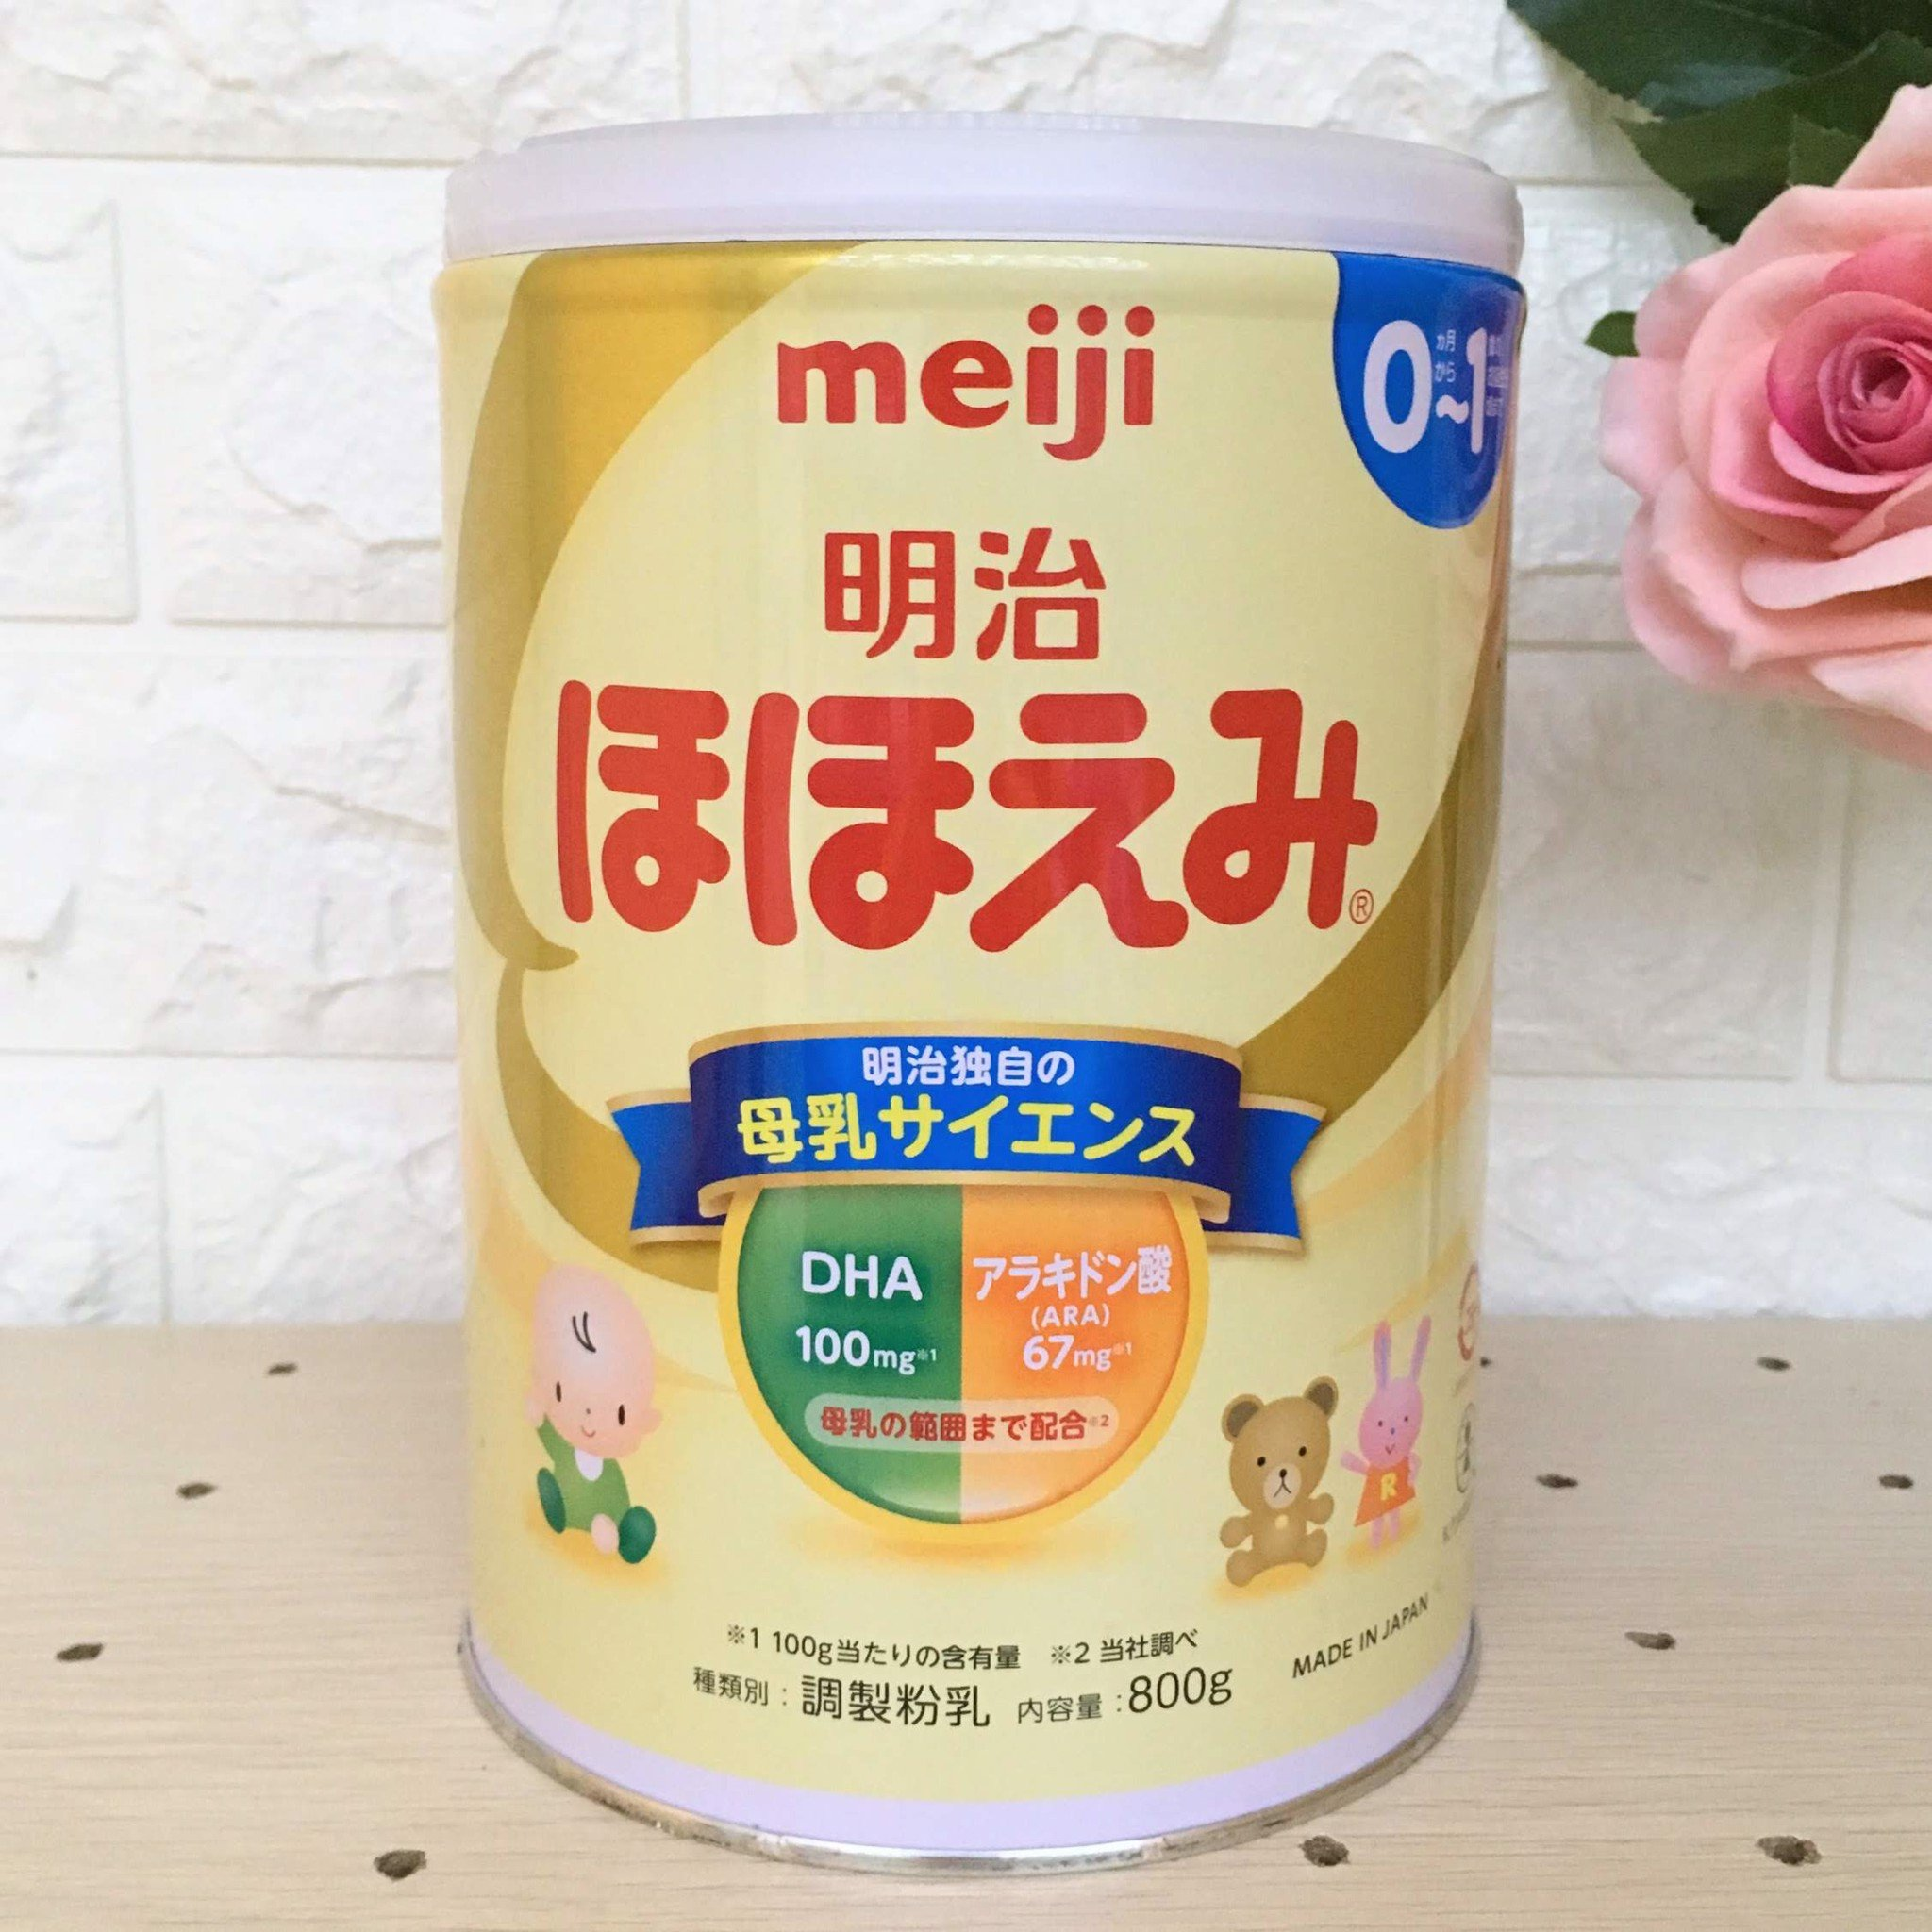 Sữa Meiji nội địa Nhật số 0